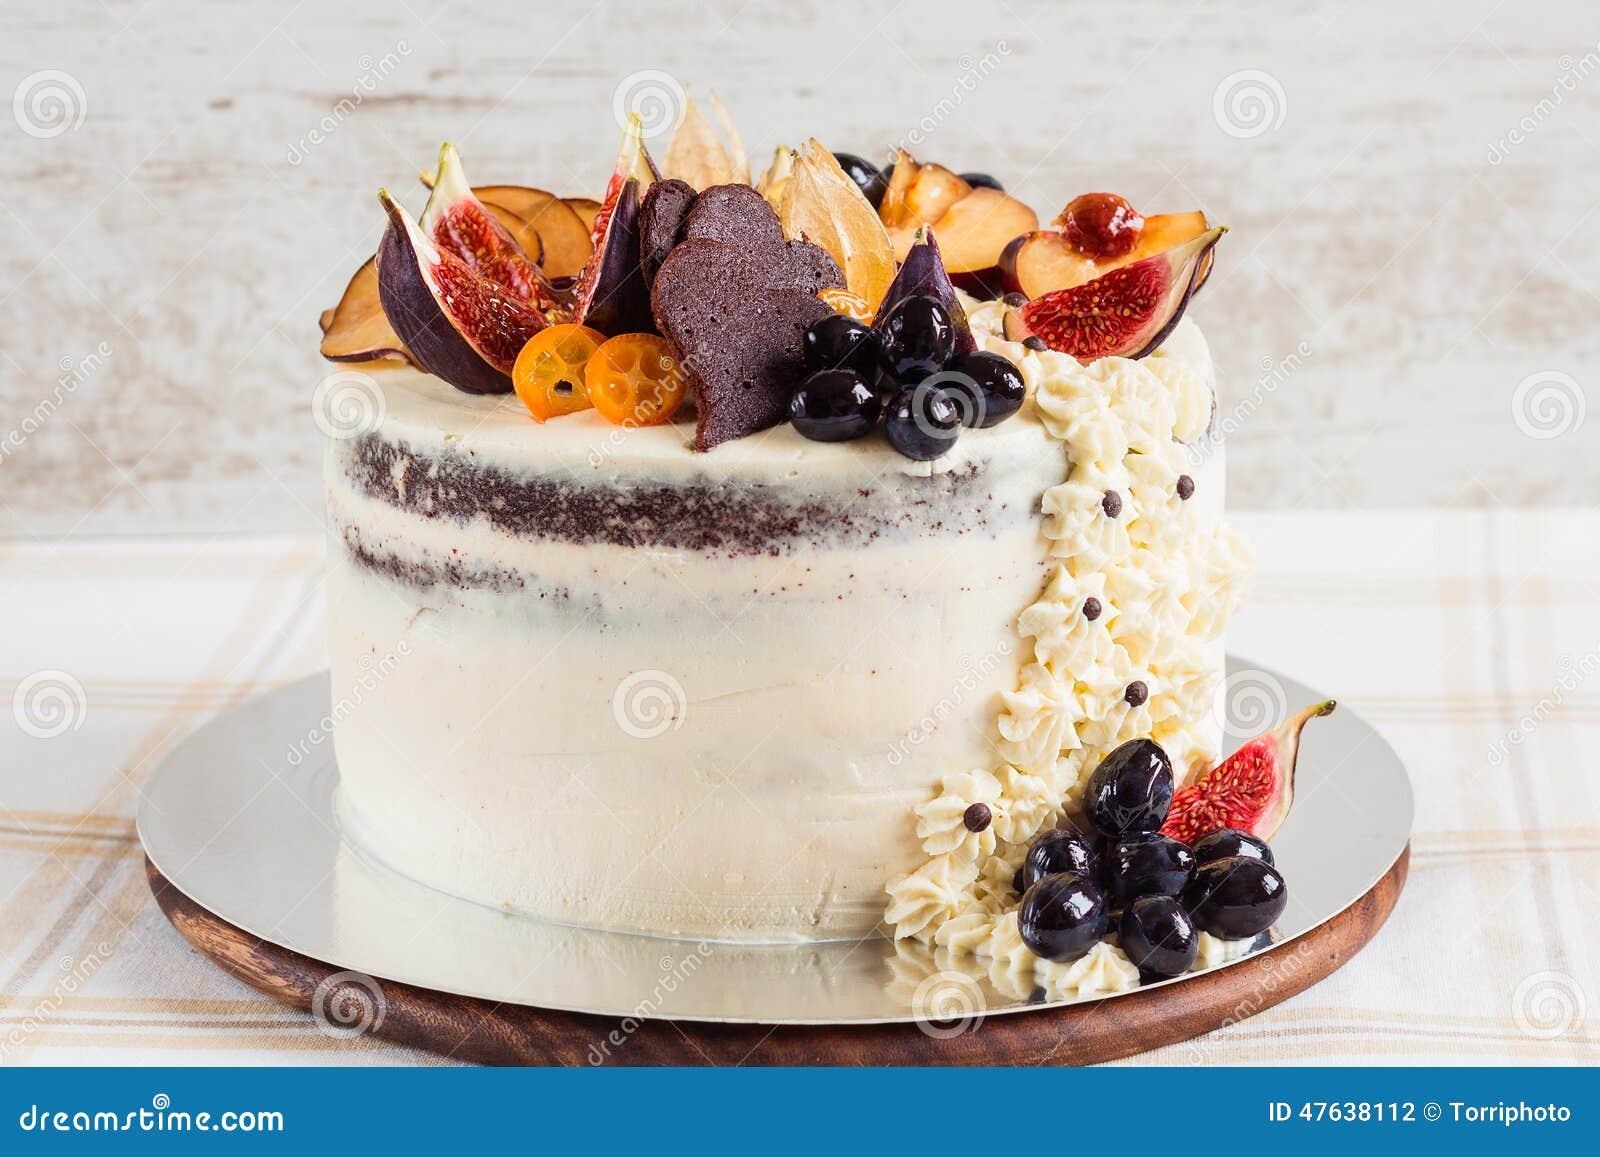 Rustic wedding cake stock photo. Image of cake, cream - 47638112